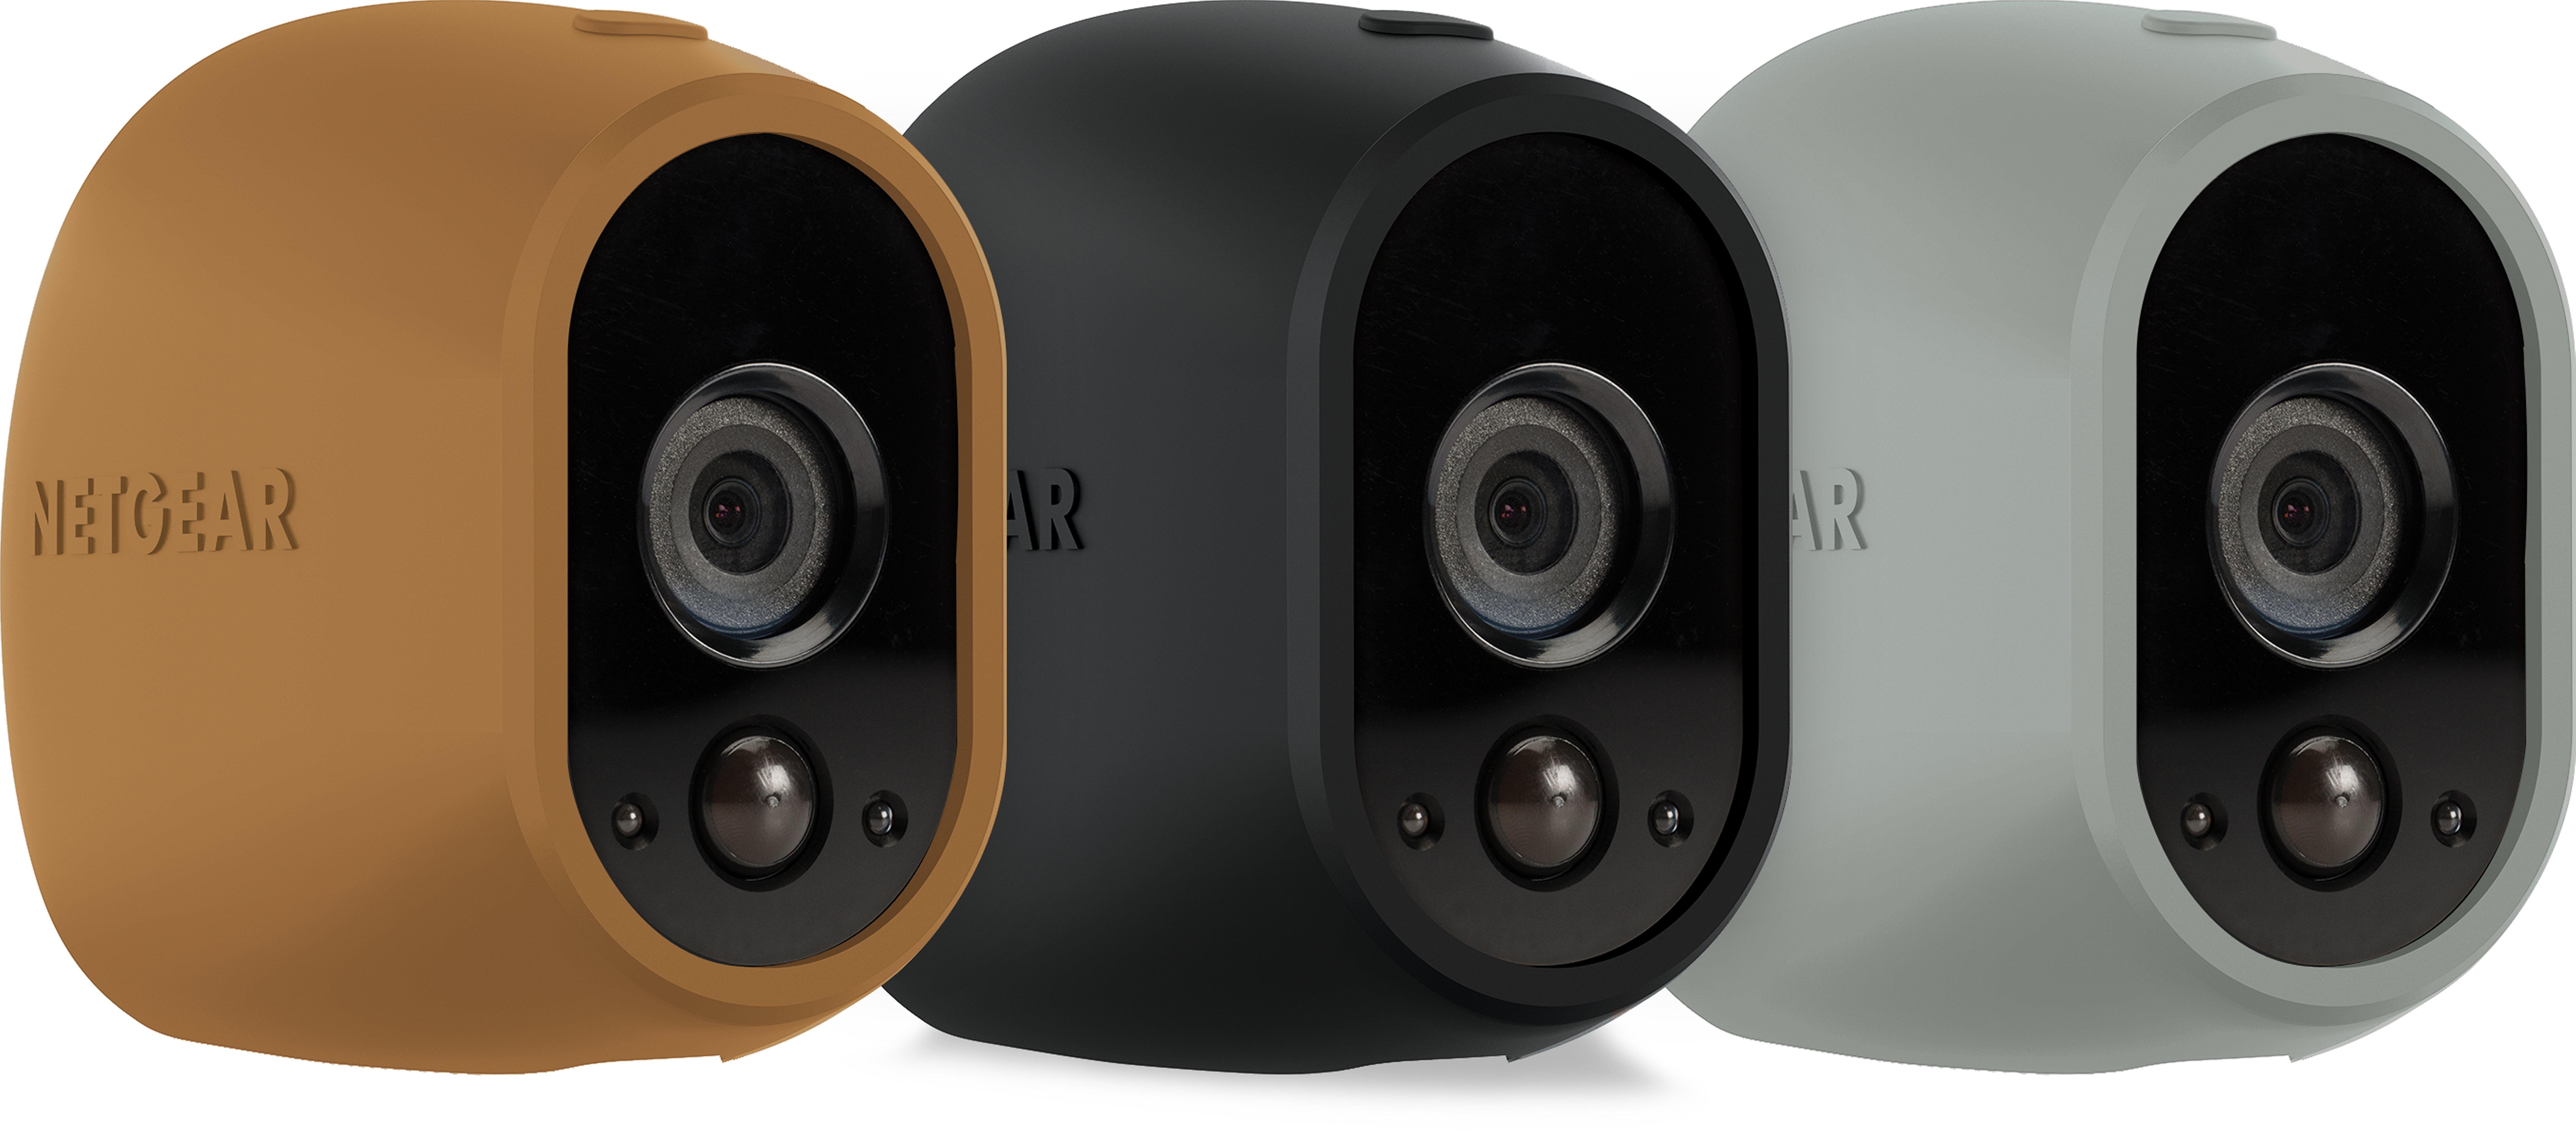 Netgear Arlo Replaceable Skins - Kameraschutzhülle - Grau, Schwarz, braun (Packung mit 3 )